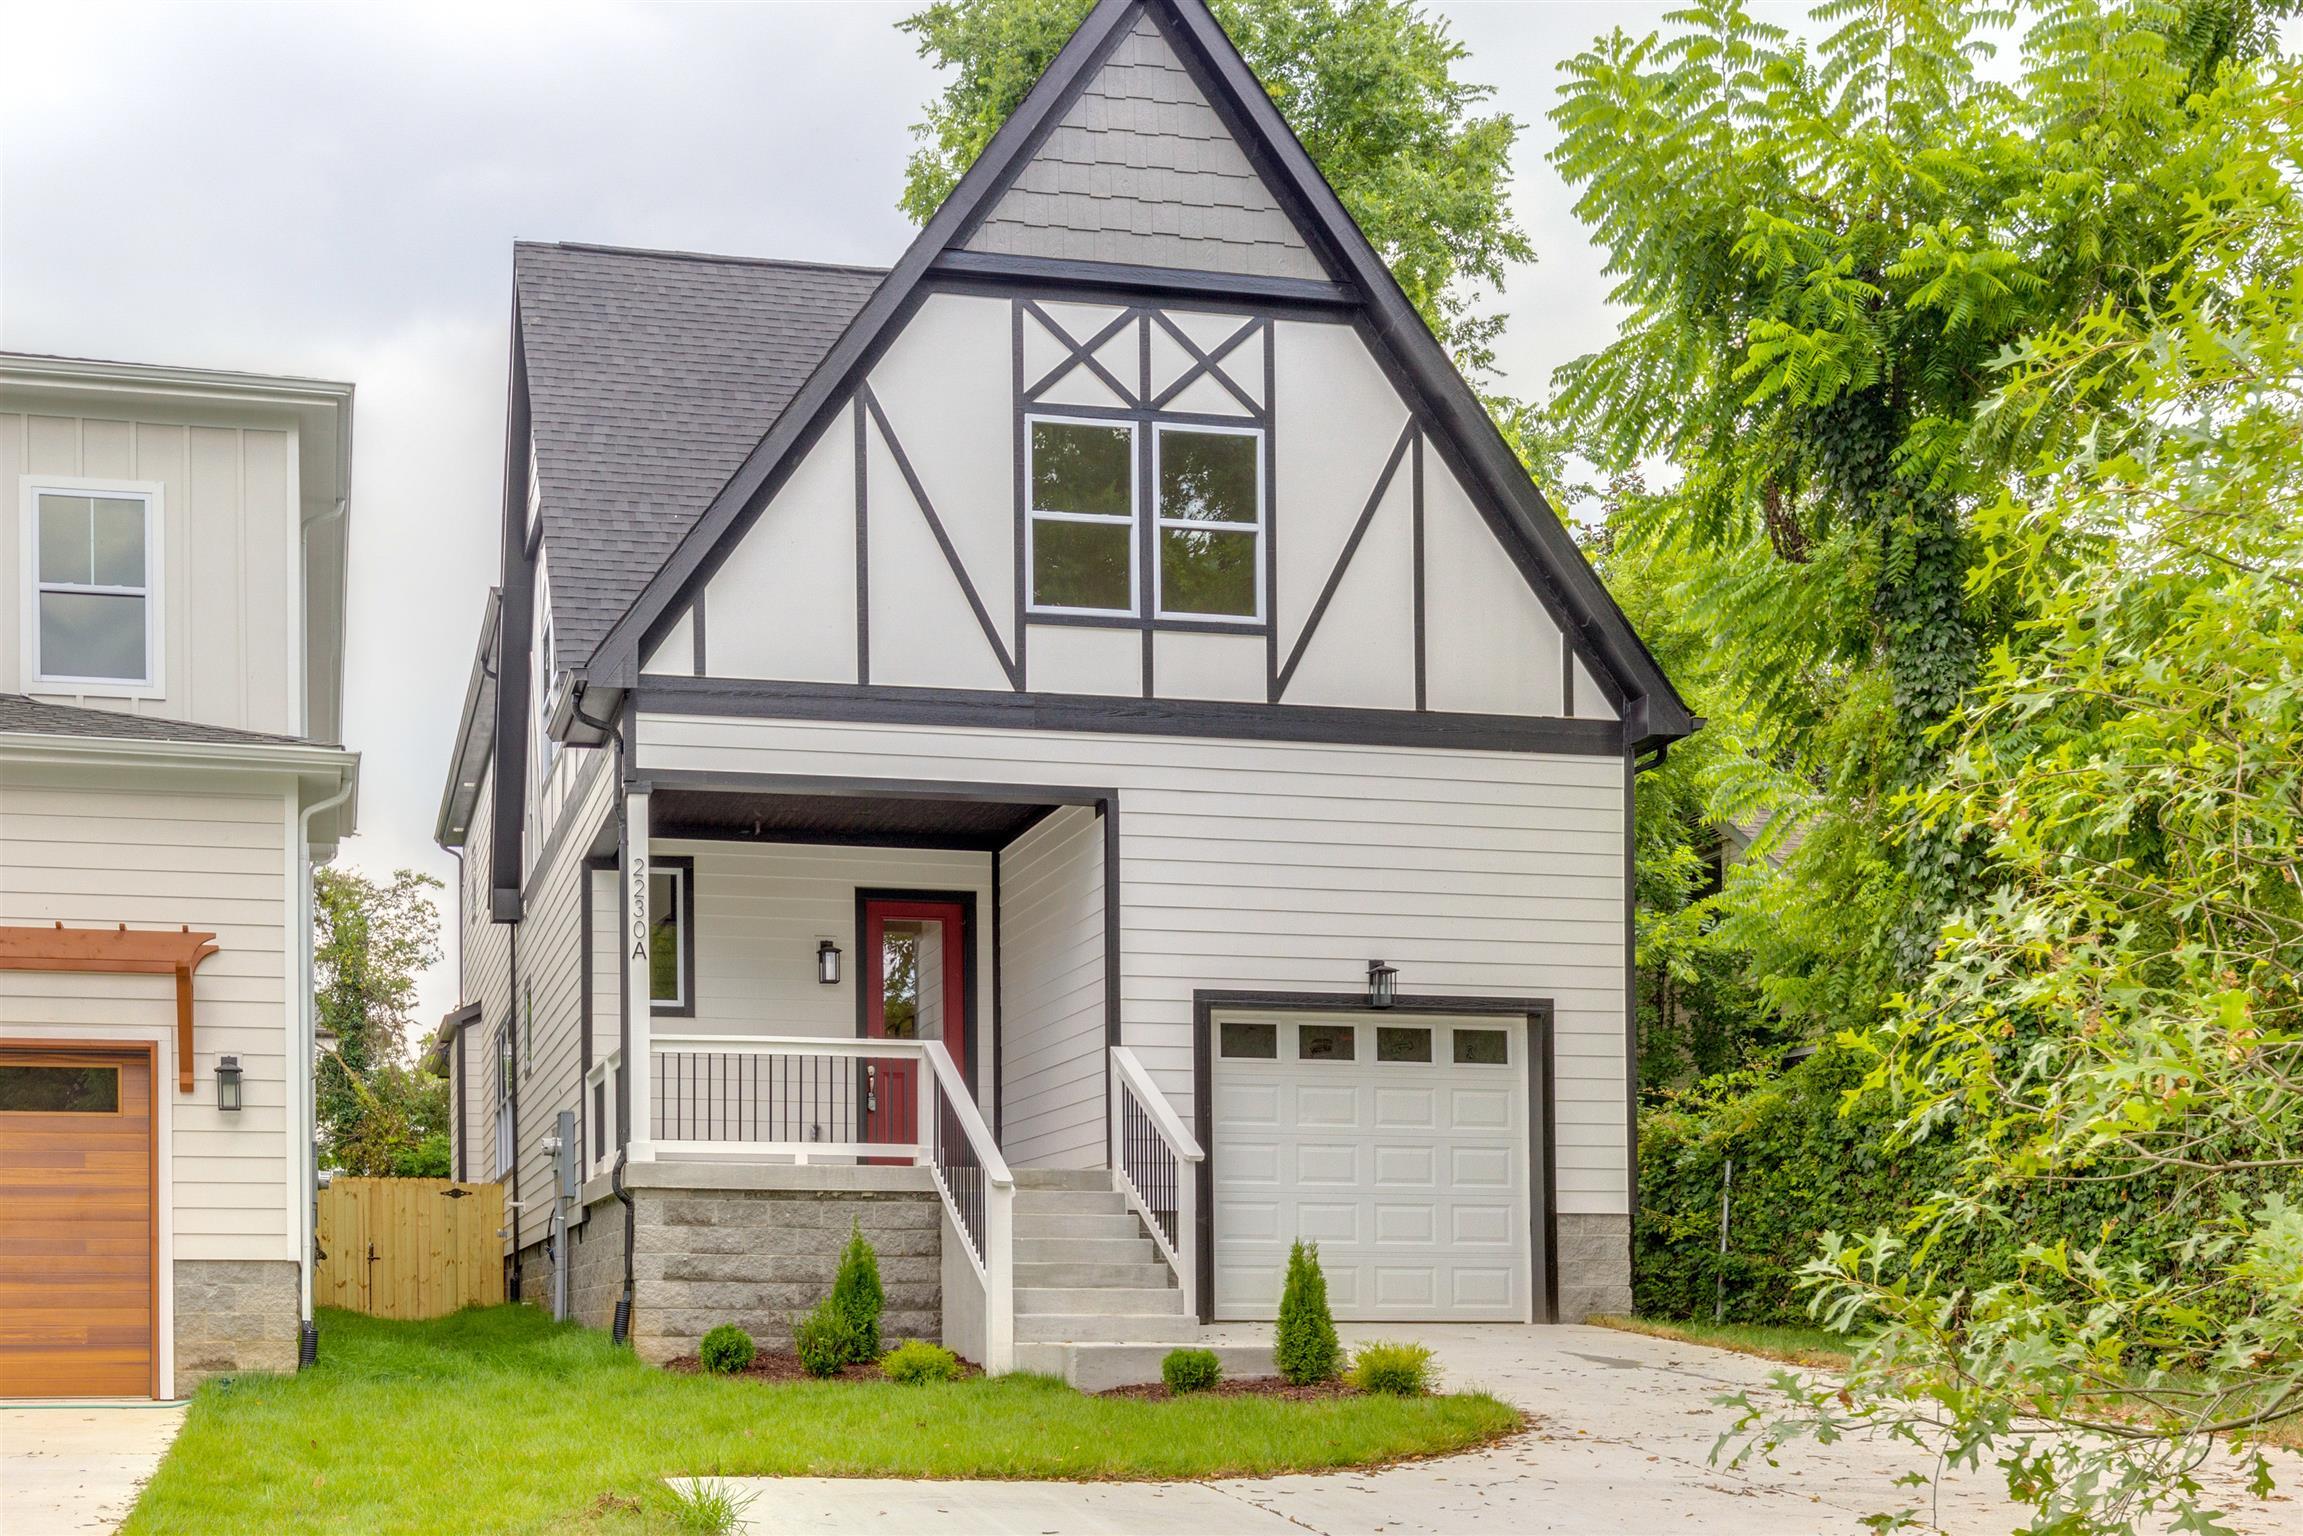 2230A Carter Avenue, Nashville, TN 37206 - Nashville, TN real estate listing